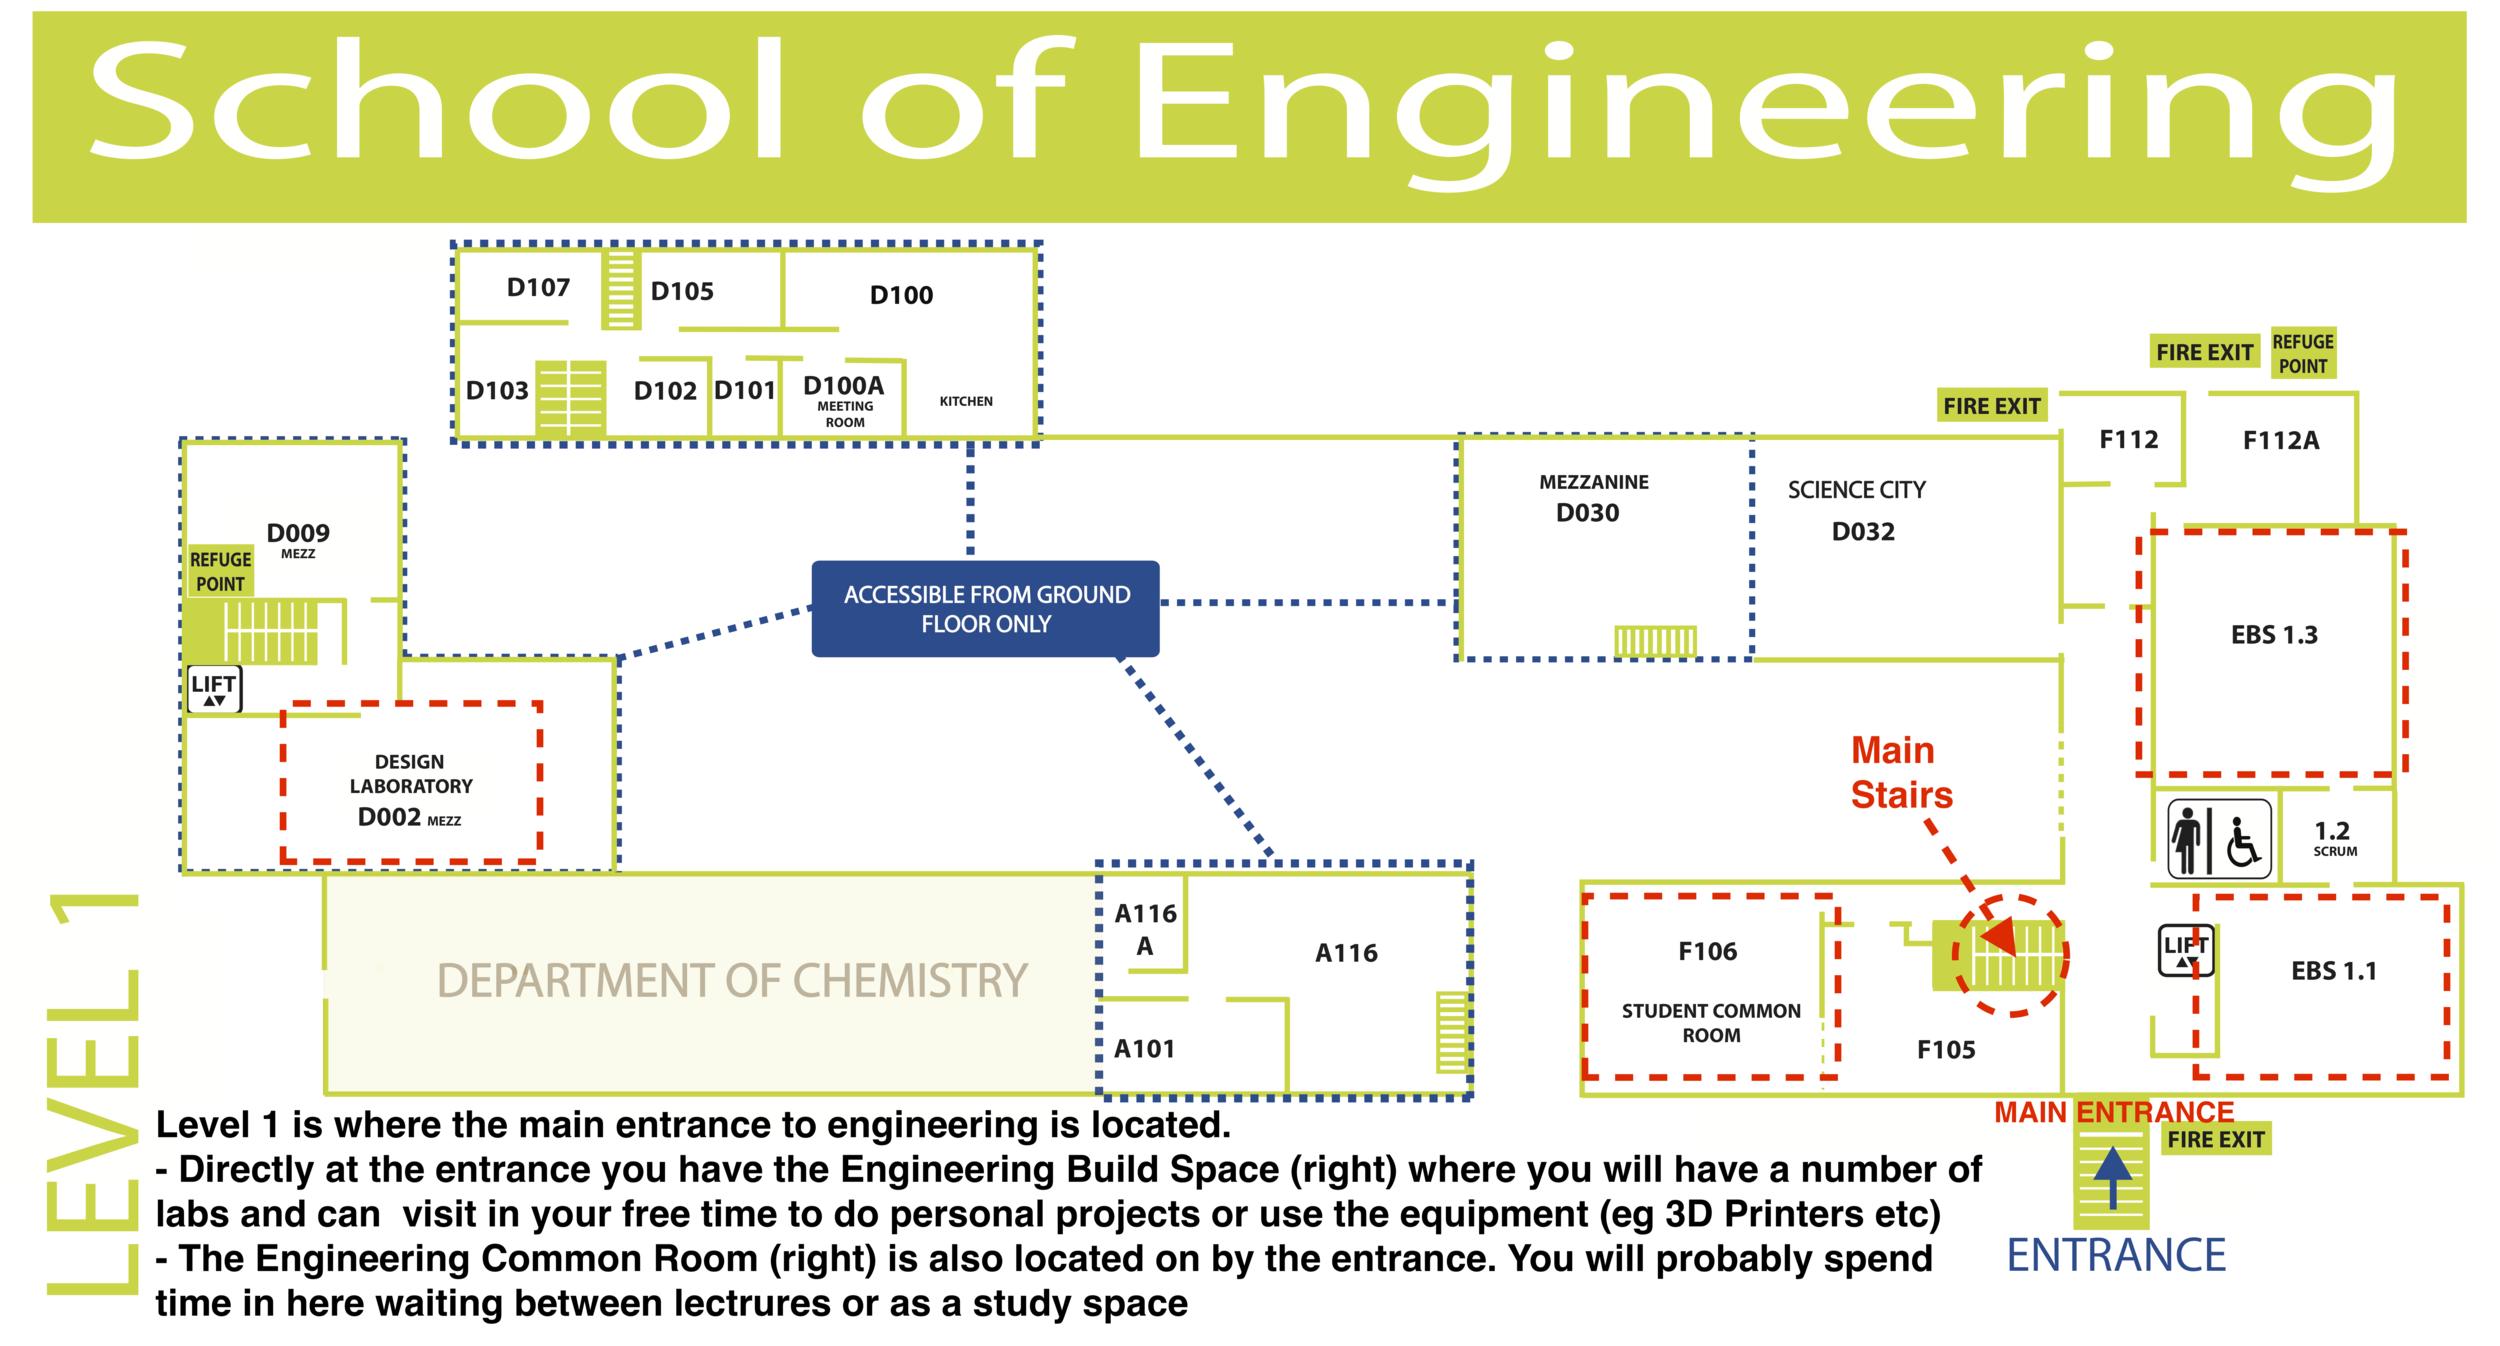 Level 1 - Engineering